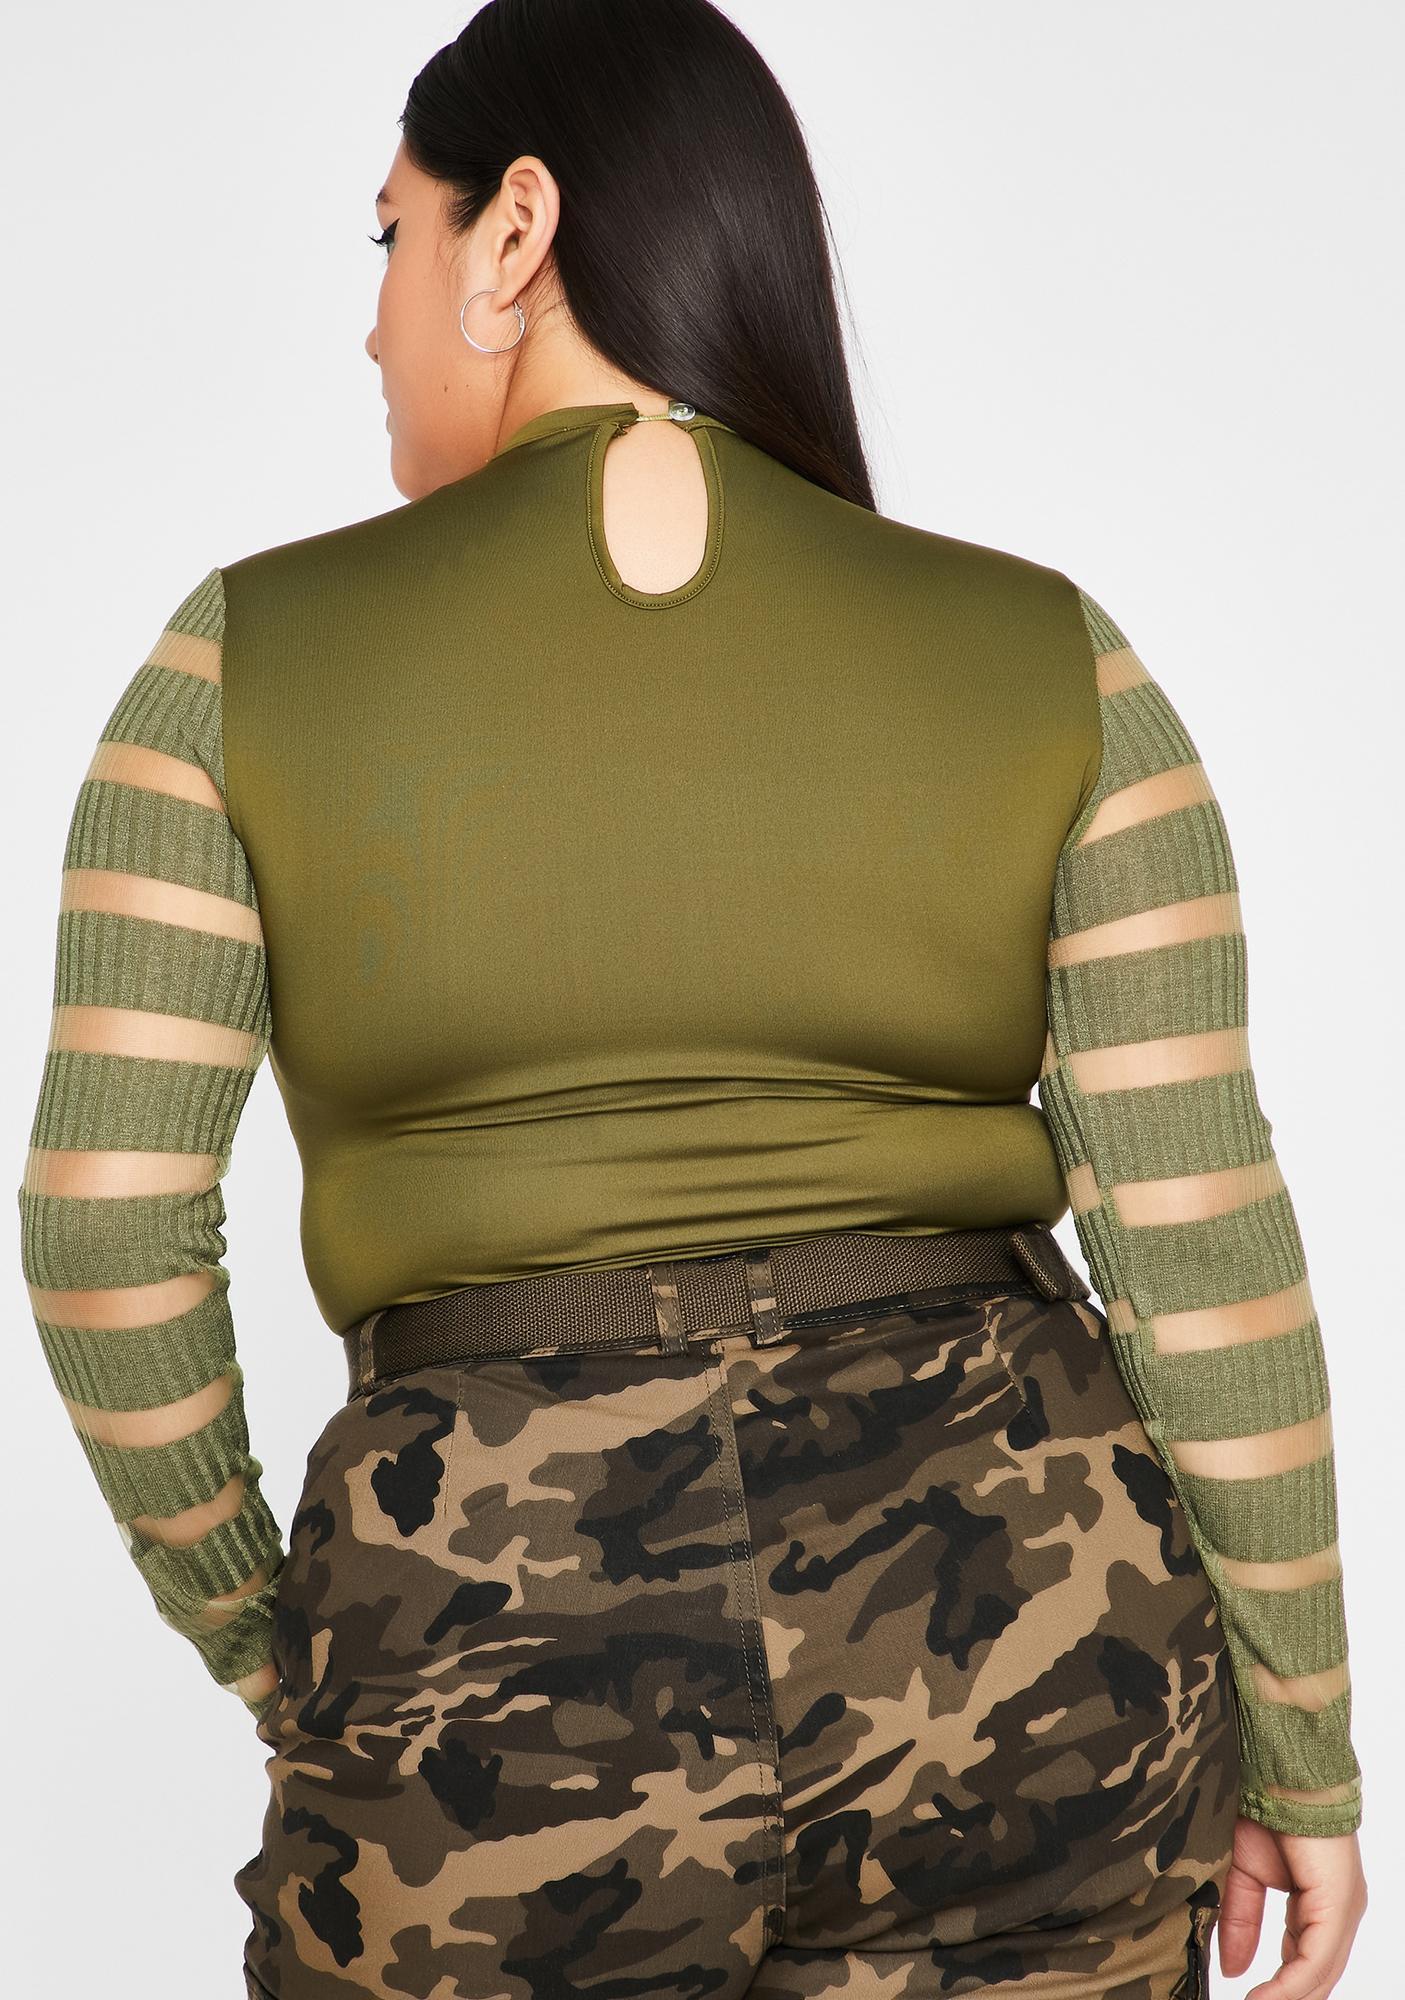 Olive In Your Dreamz Sheer Bodysuit